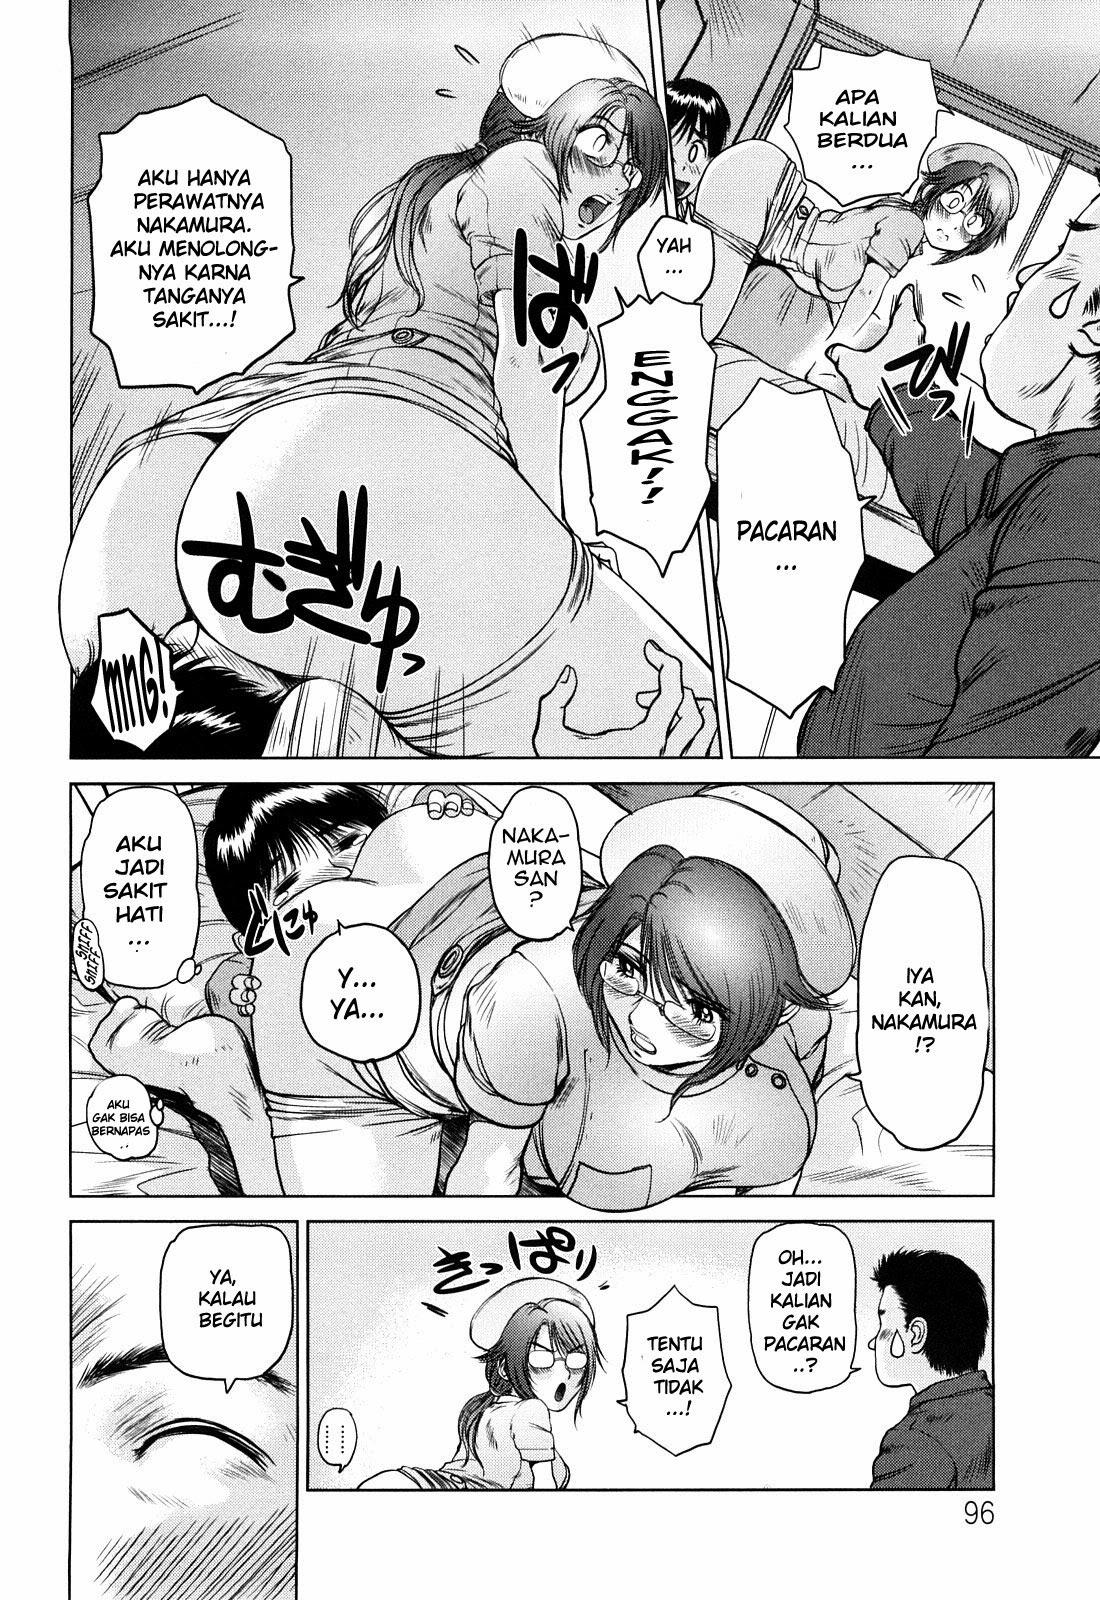 Komik Hentai Suster Semok bikin sange 2 Pasien Manga Sex Porn Doujin XXX Bokep 10